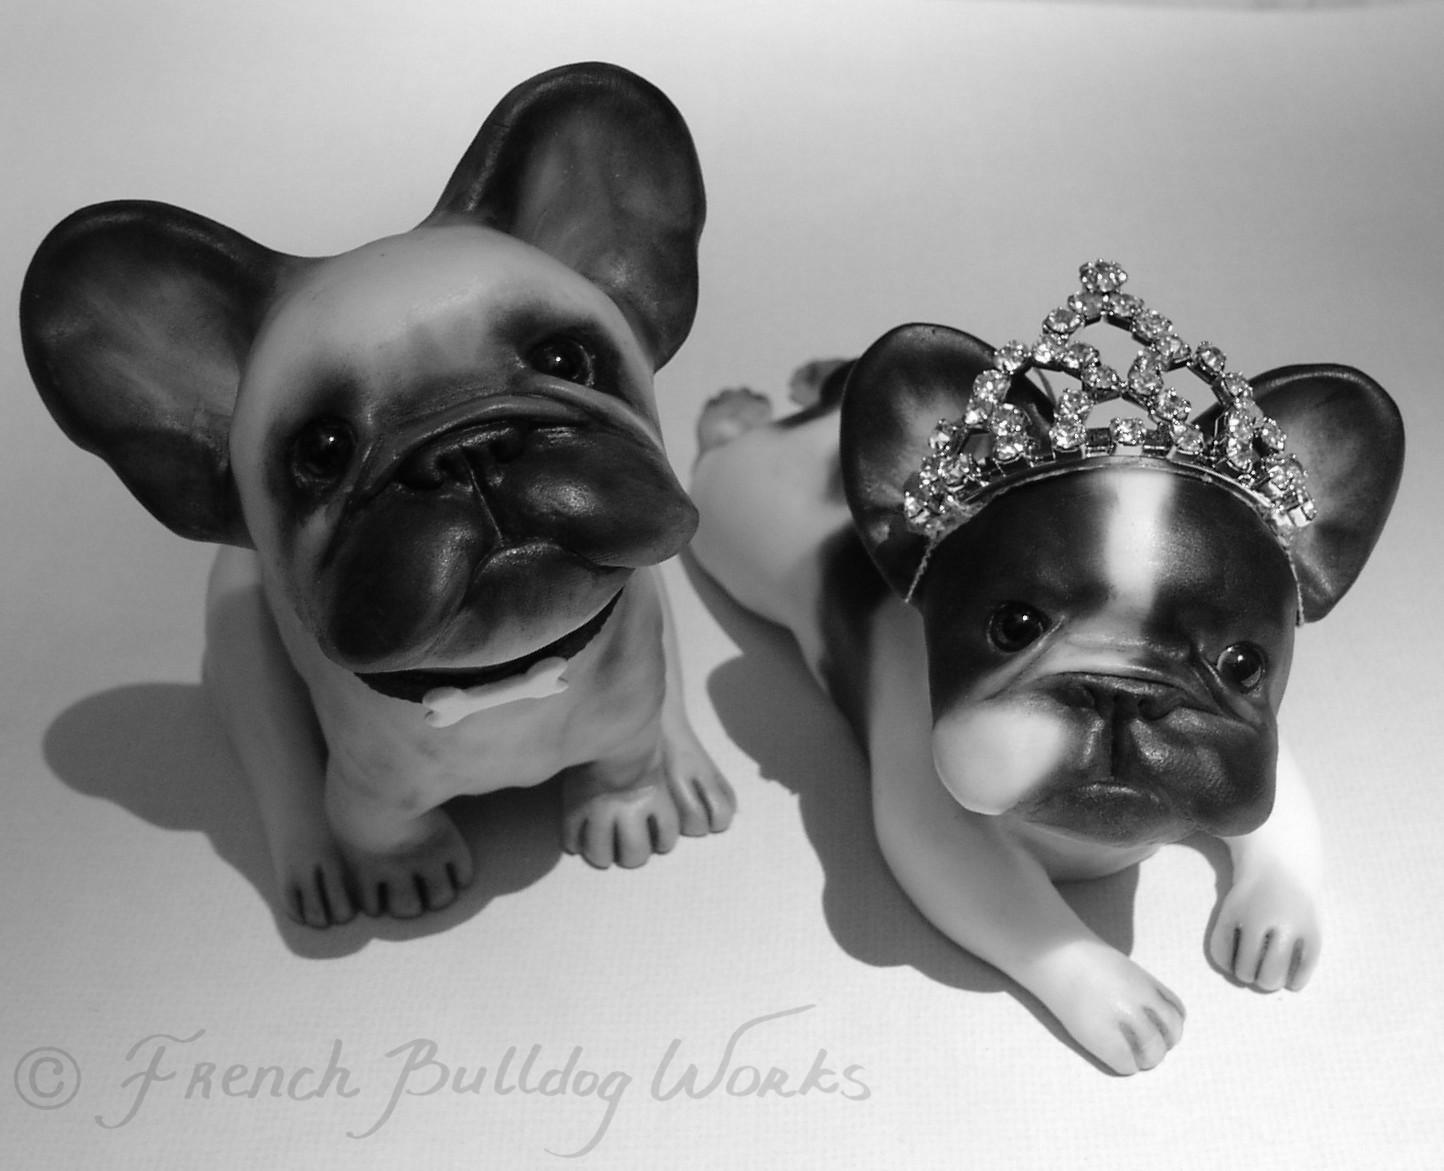 French Bulldog Wedding Cake Toppers